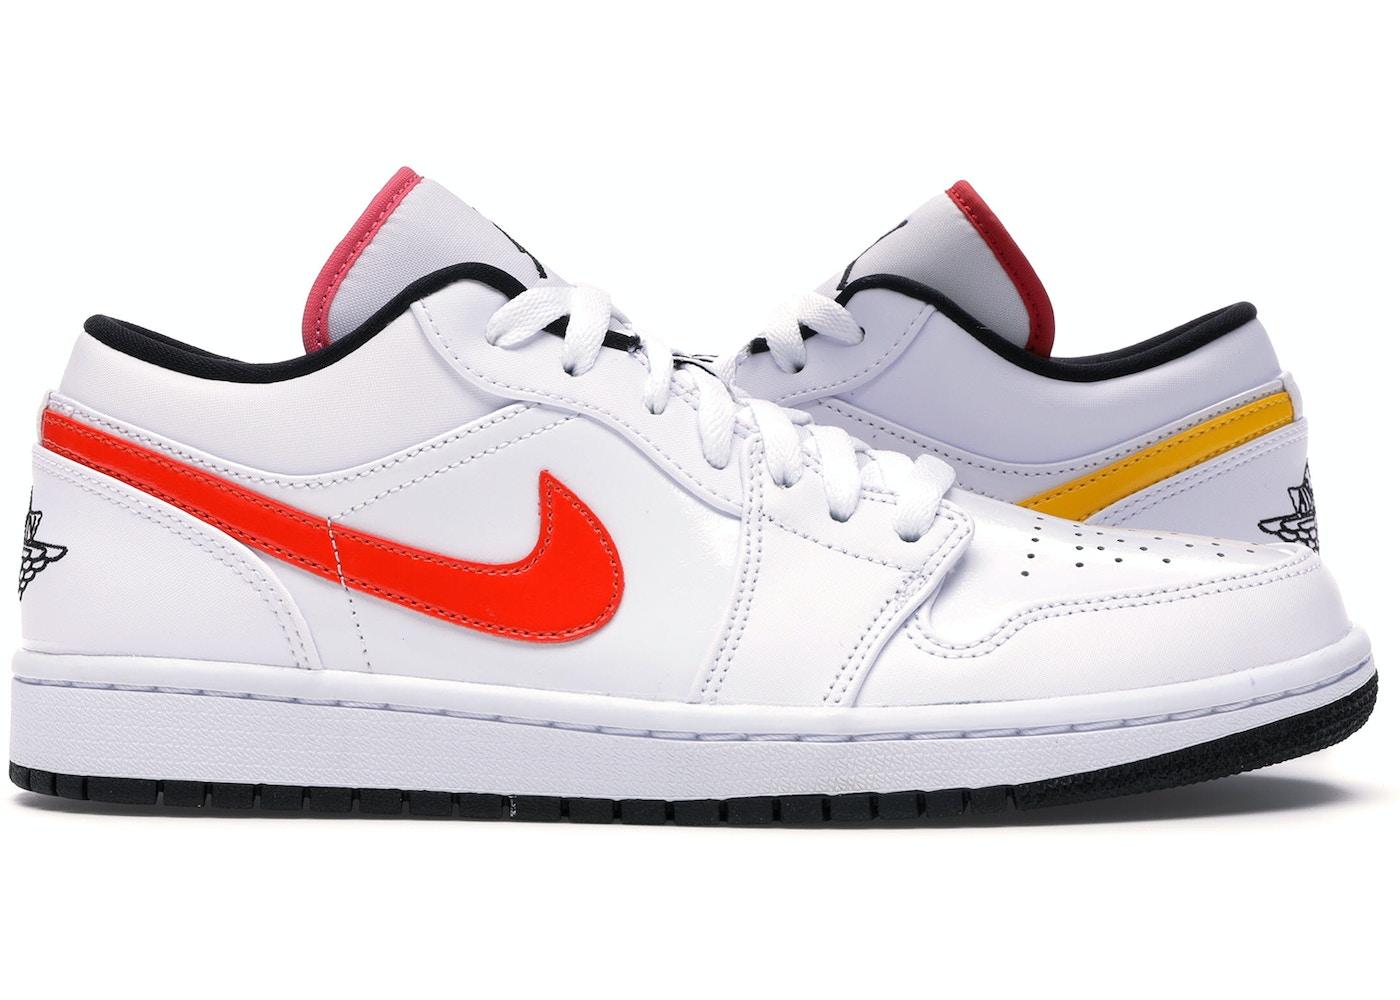 Jordan 1 Low White Multi Color Cw7009 100